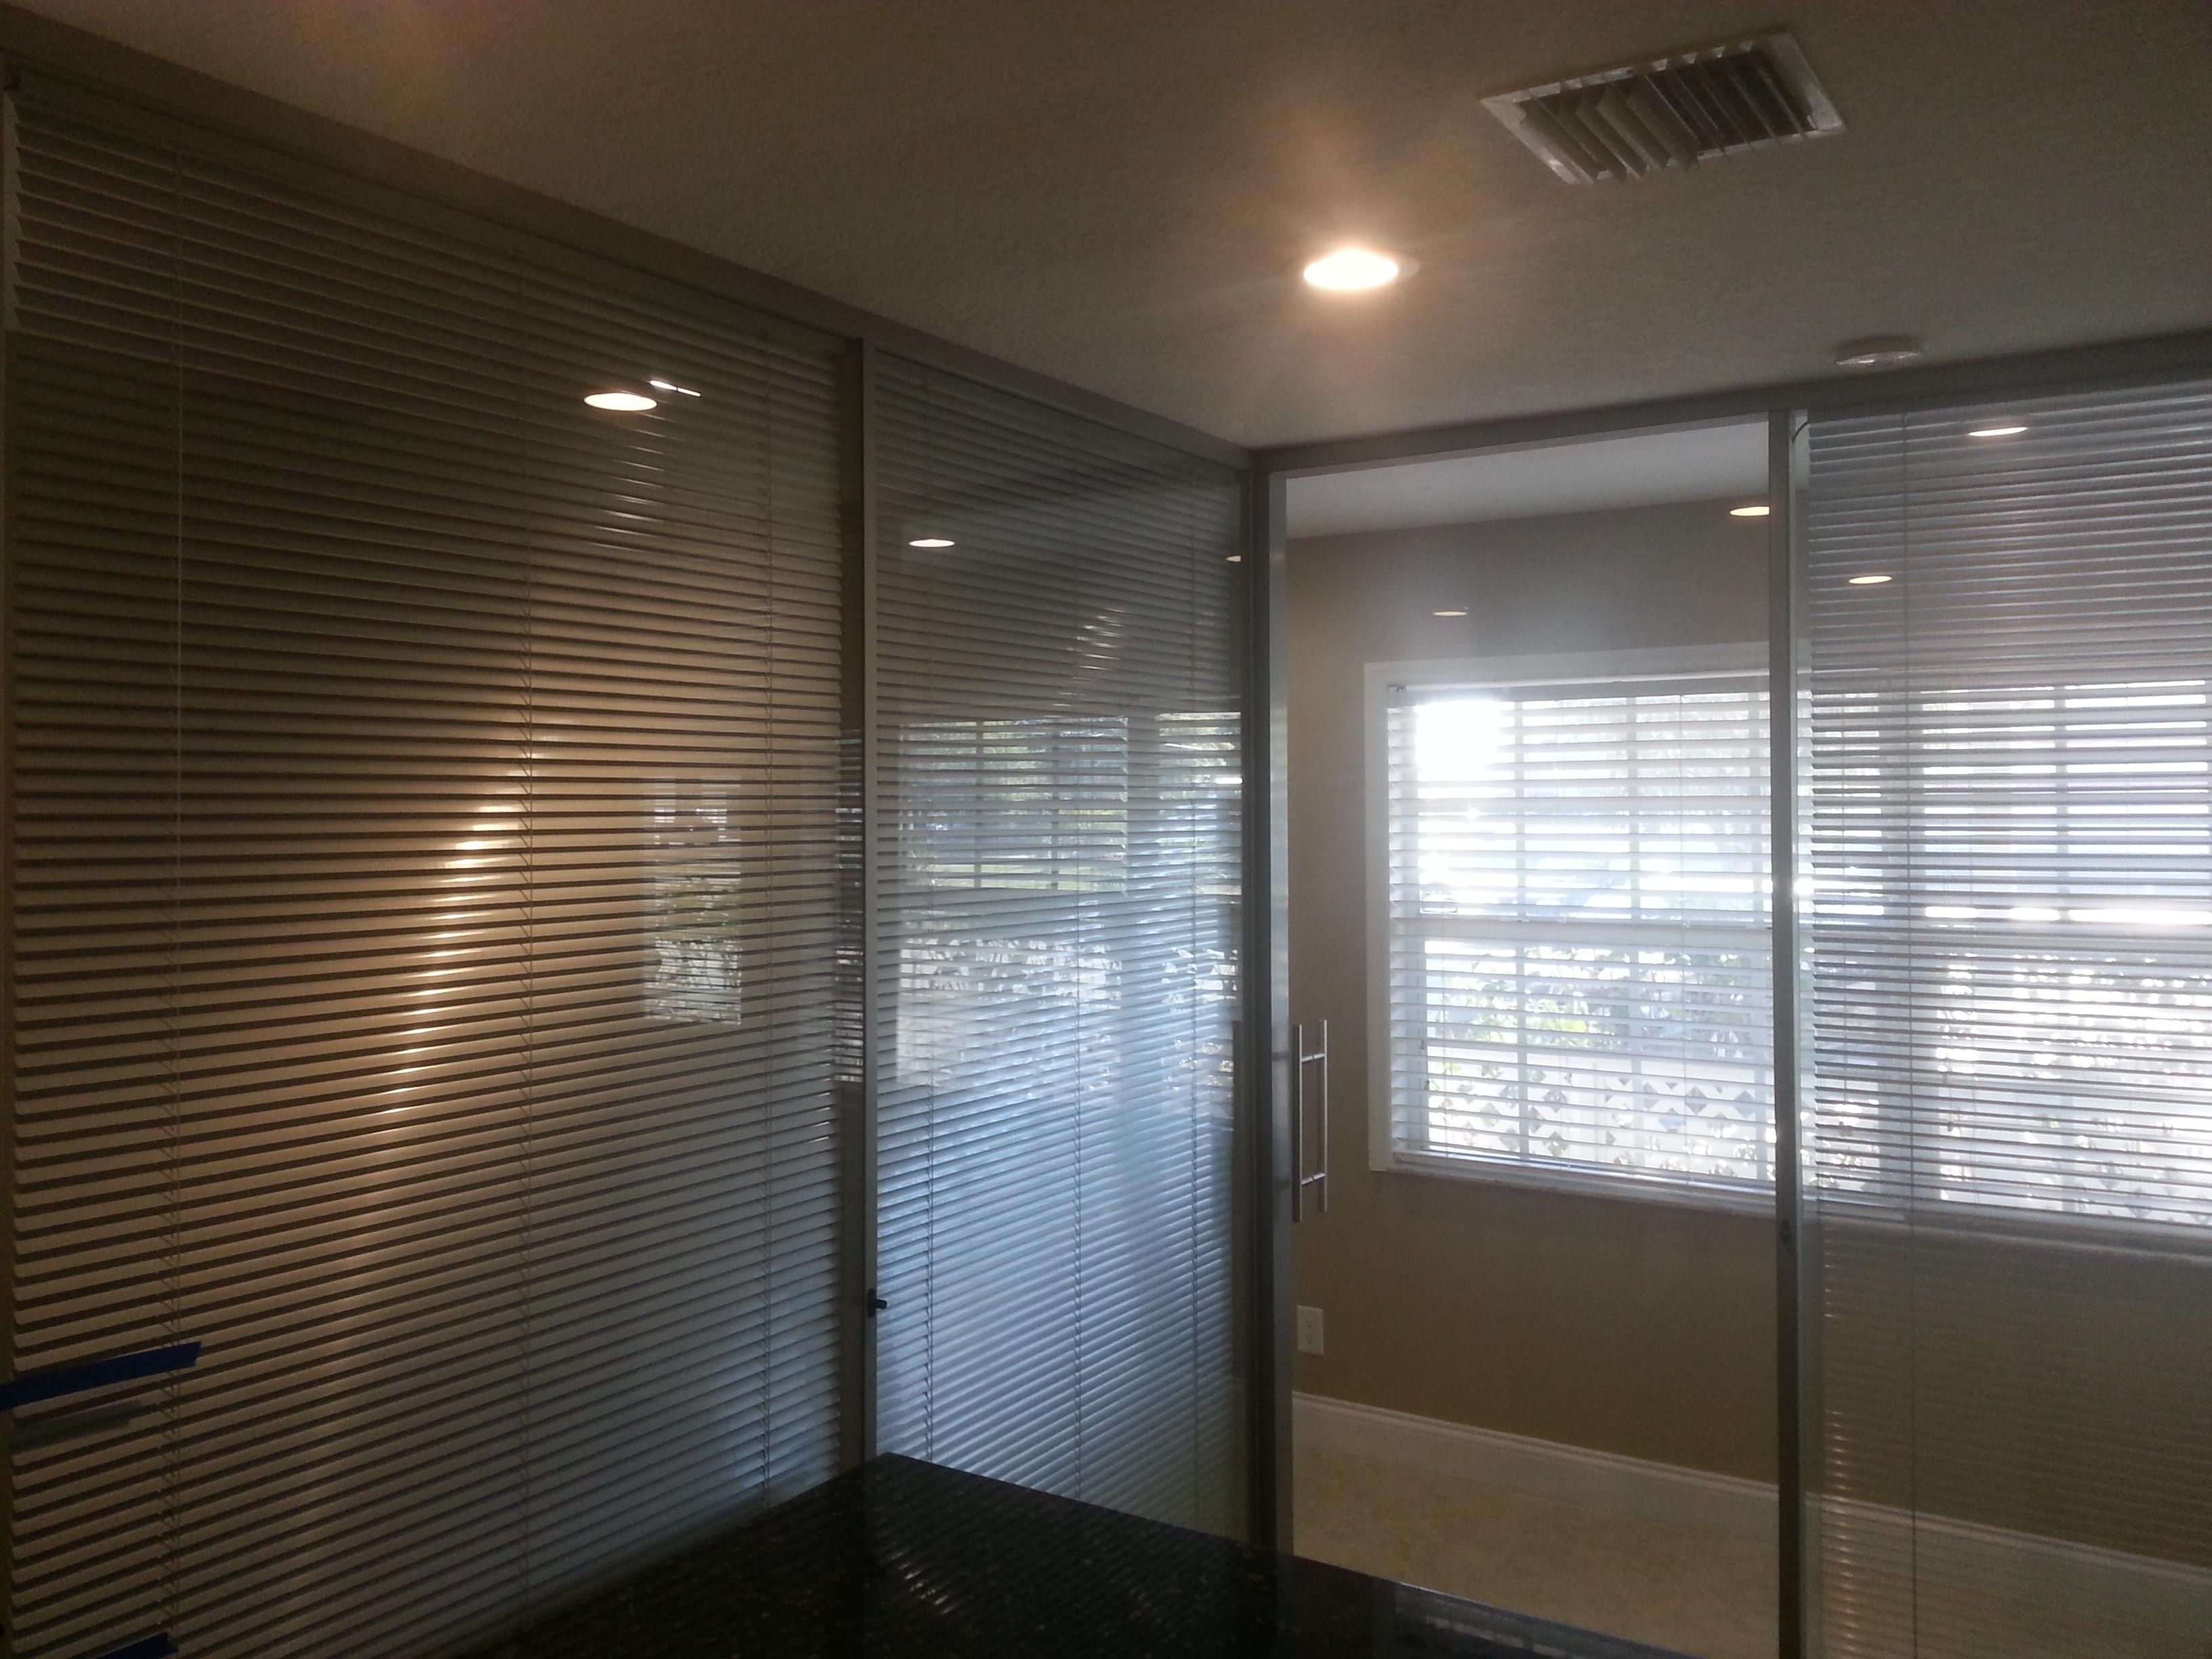 manasota-office-supplies-llc-20170320-172631-2-.jpg